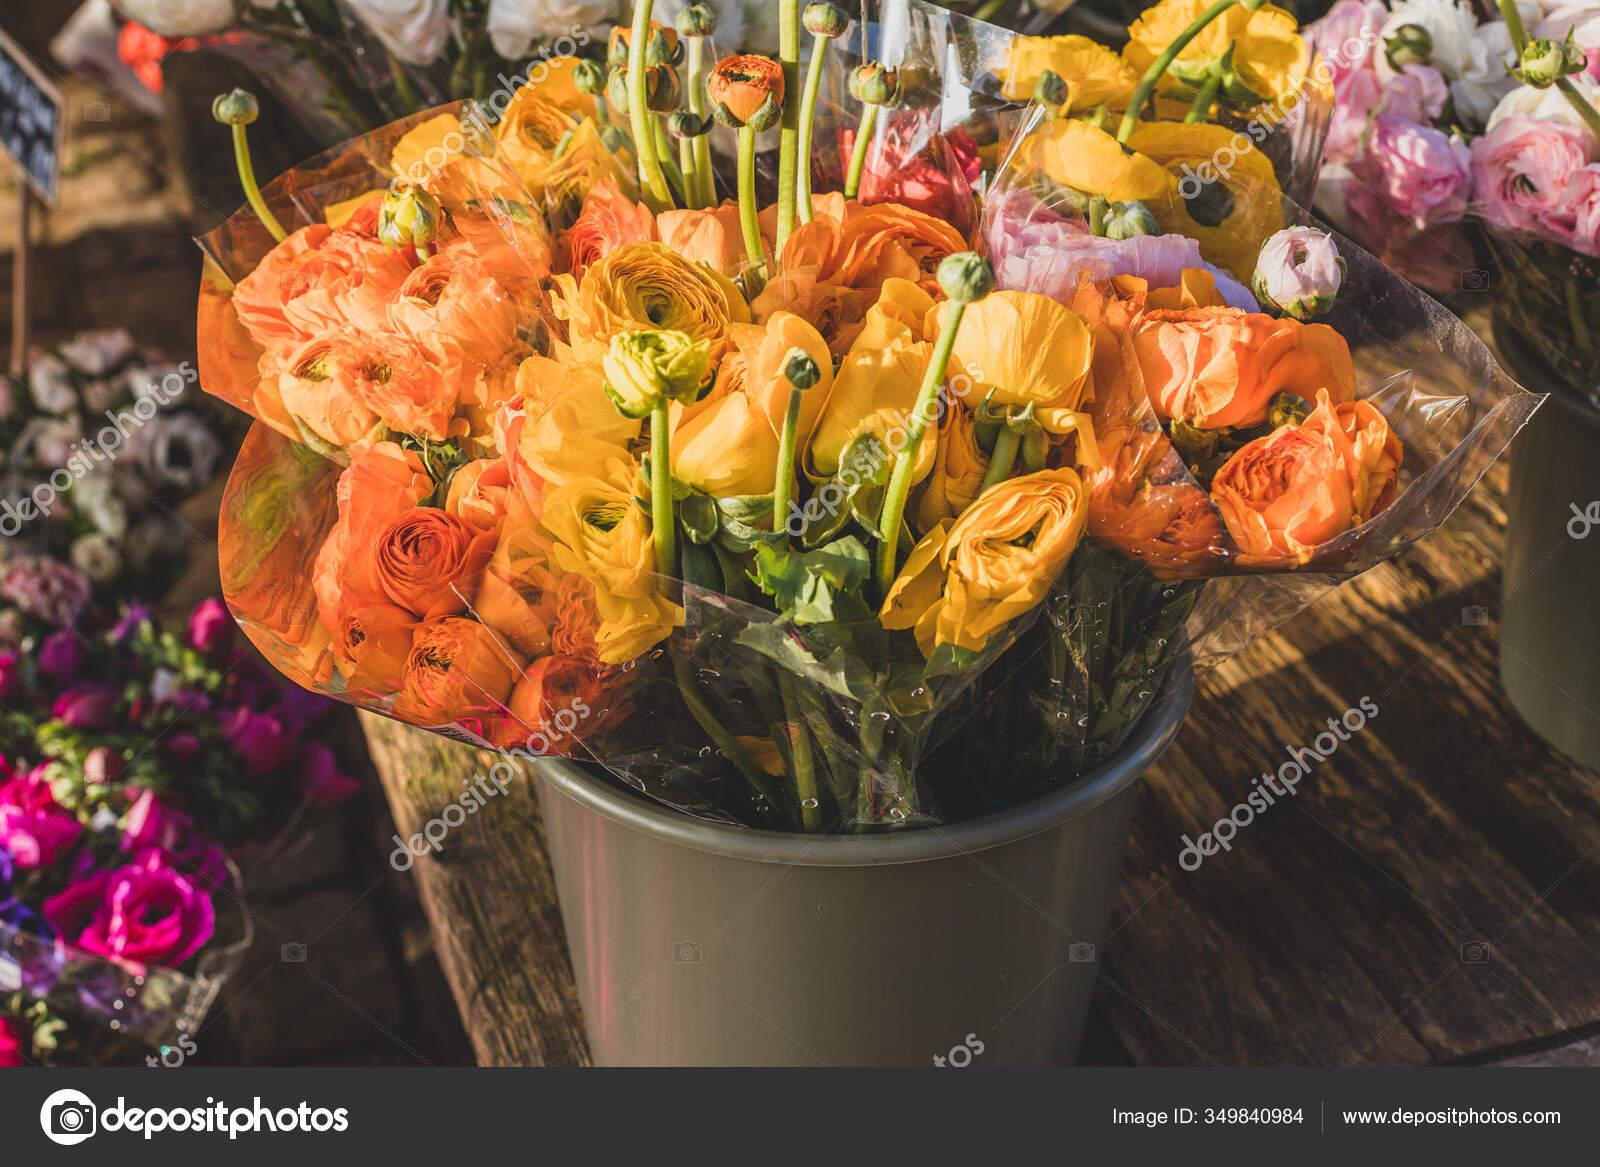 Bouquets Orange Ranunculus Flower Street Market Stock Photo C Ursaminorph 349840984